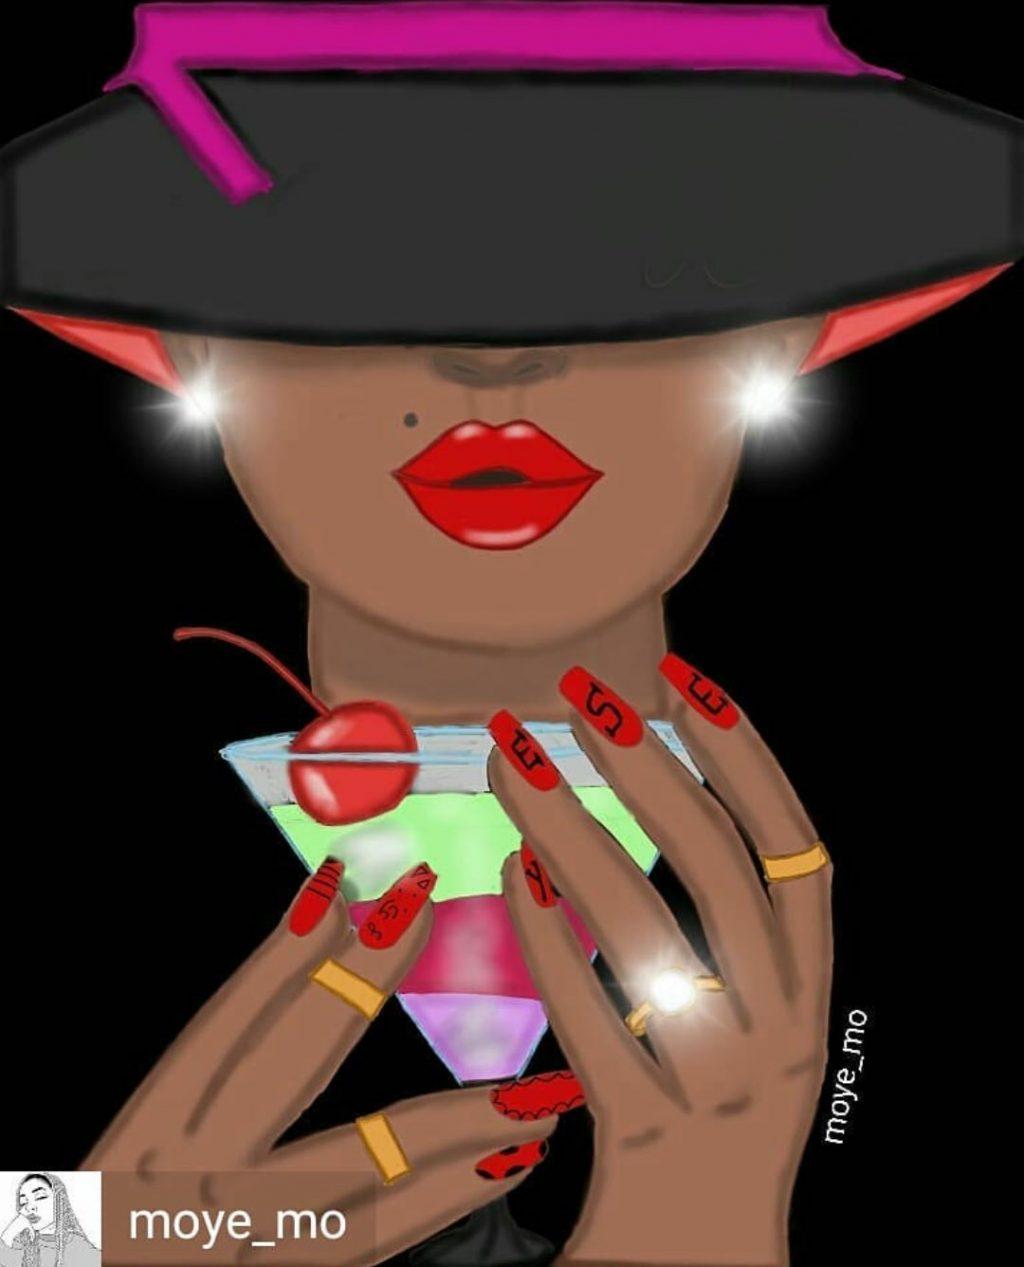 Fashion Illustration by Martwayne Student